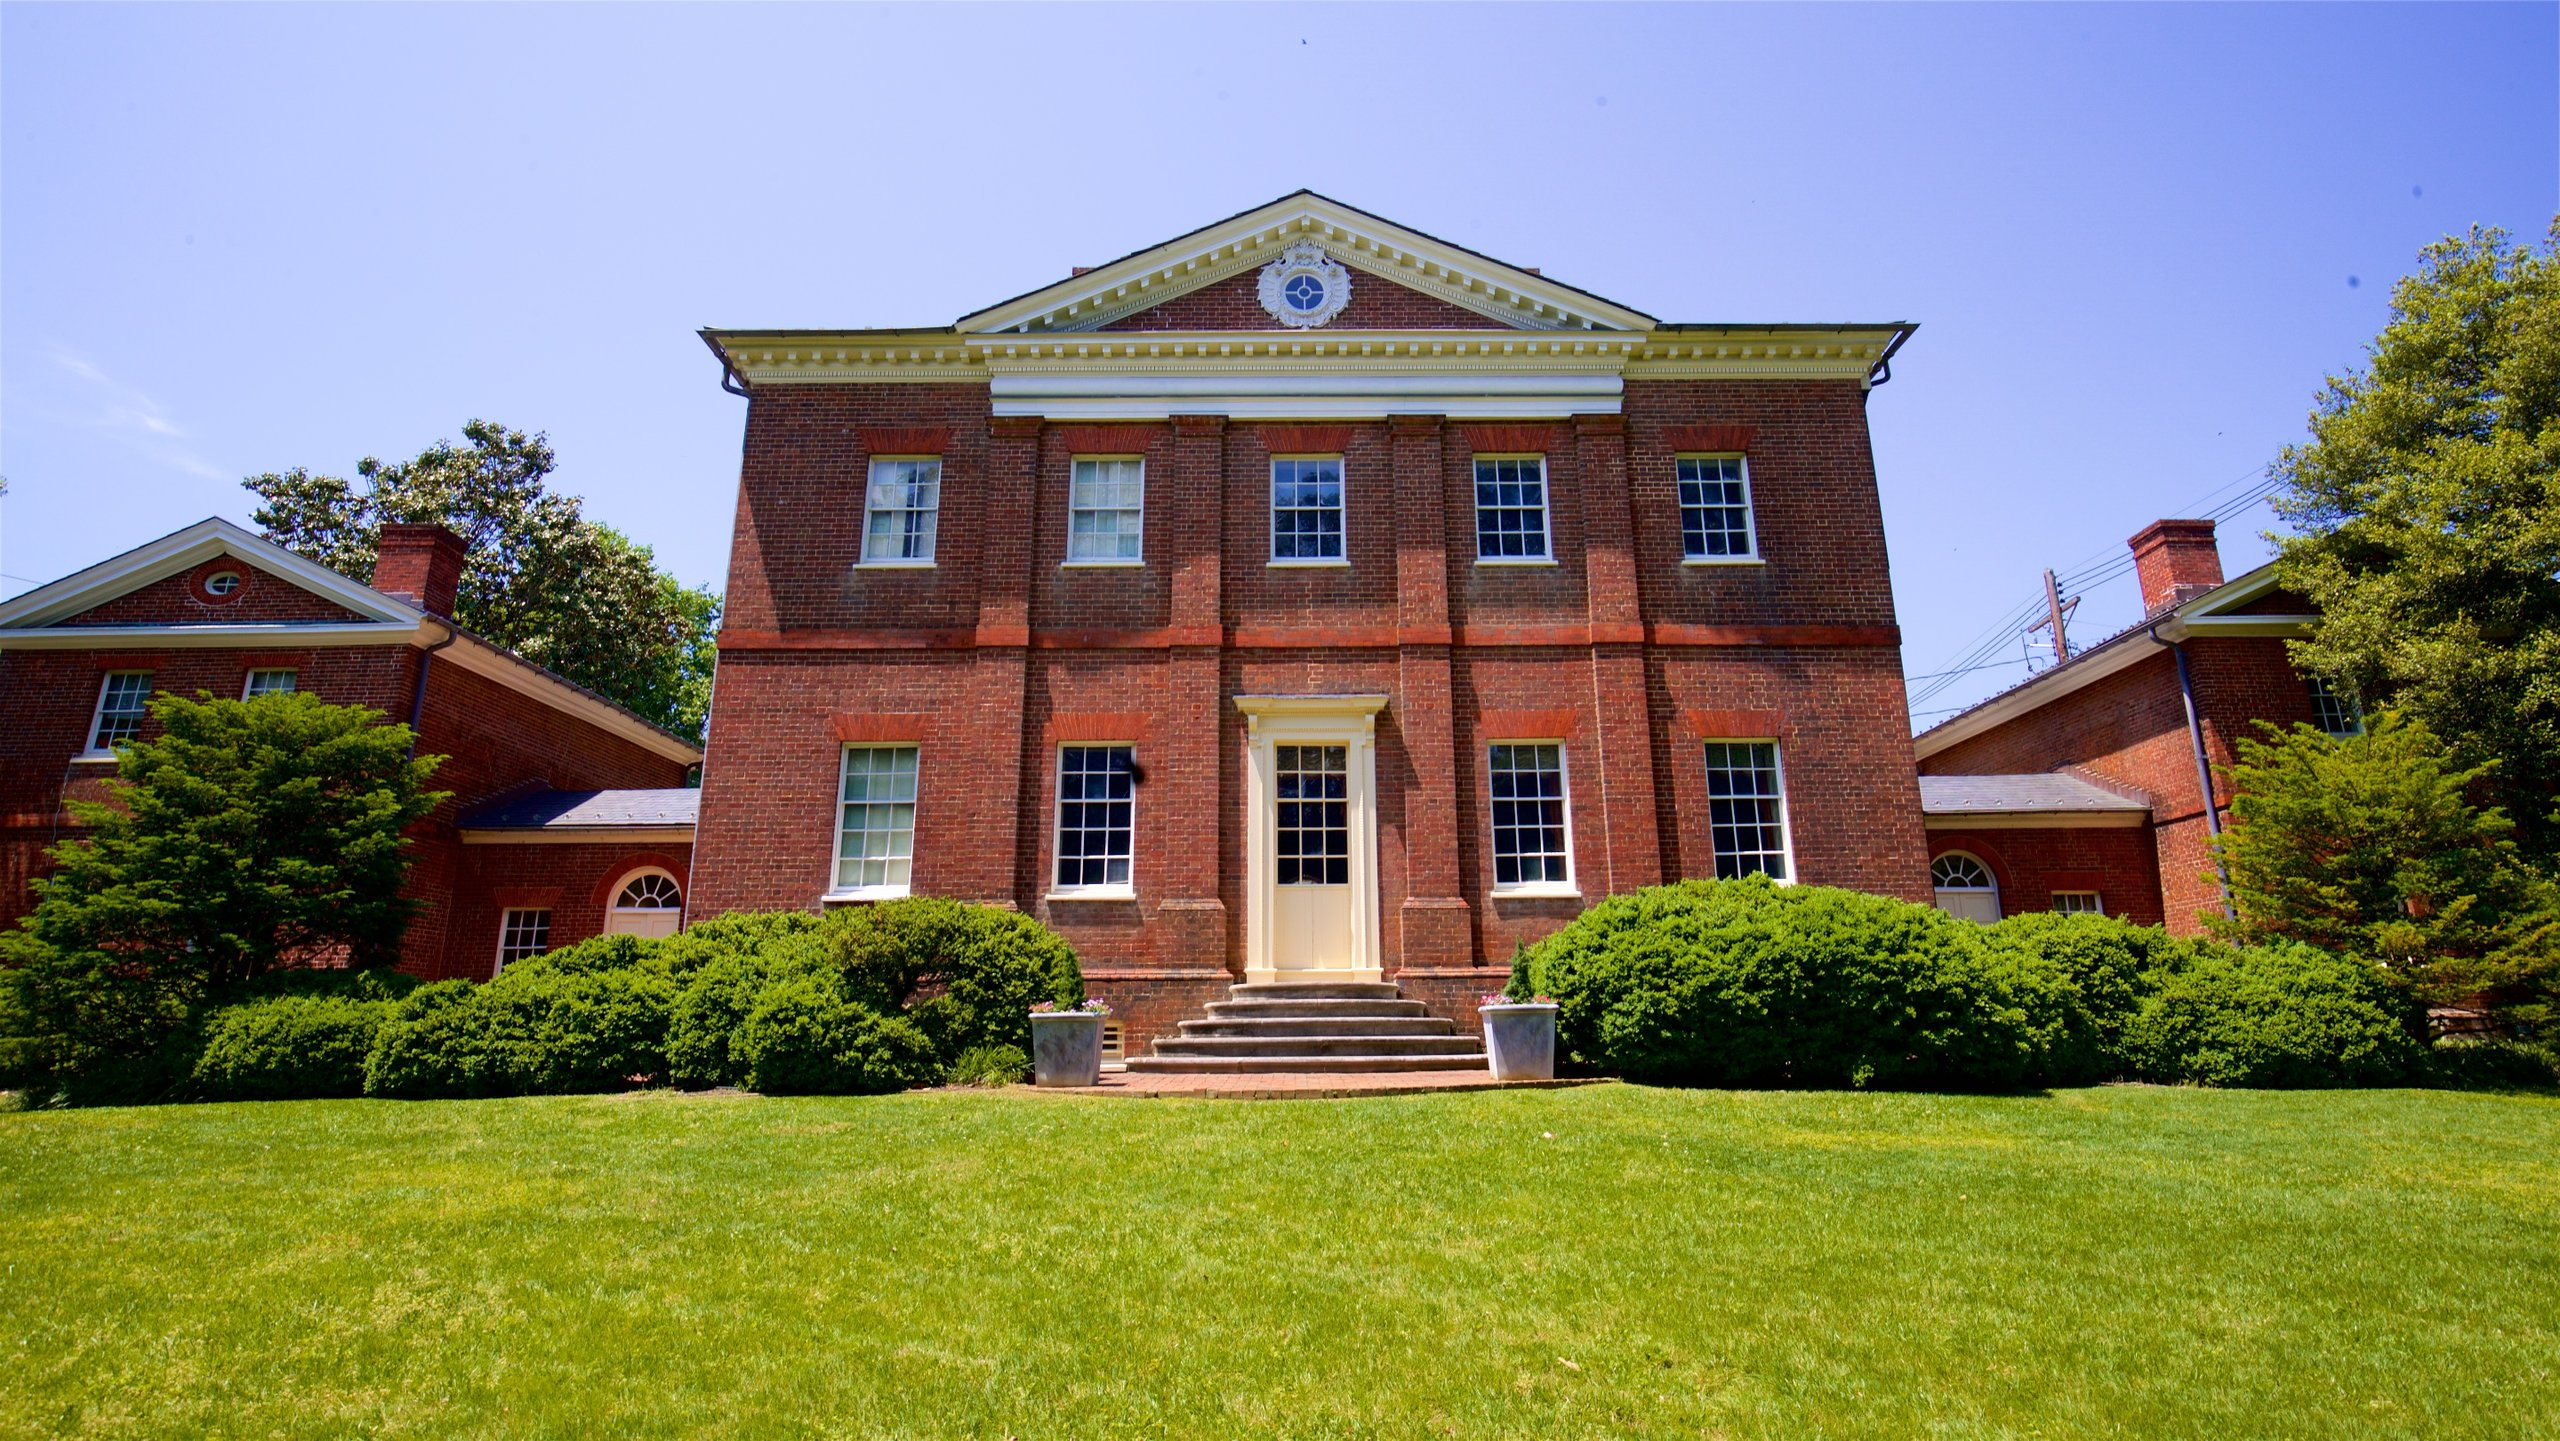 Hammond-Harwood House, Annapolis, Maryland, United States of America